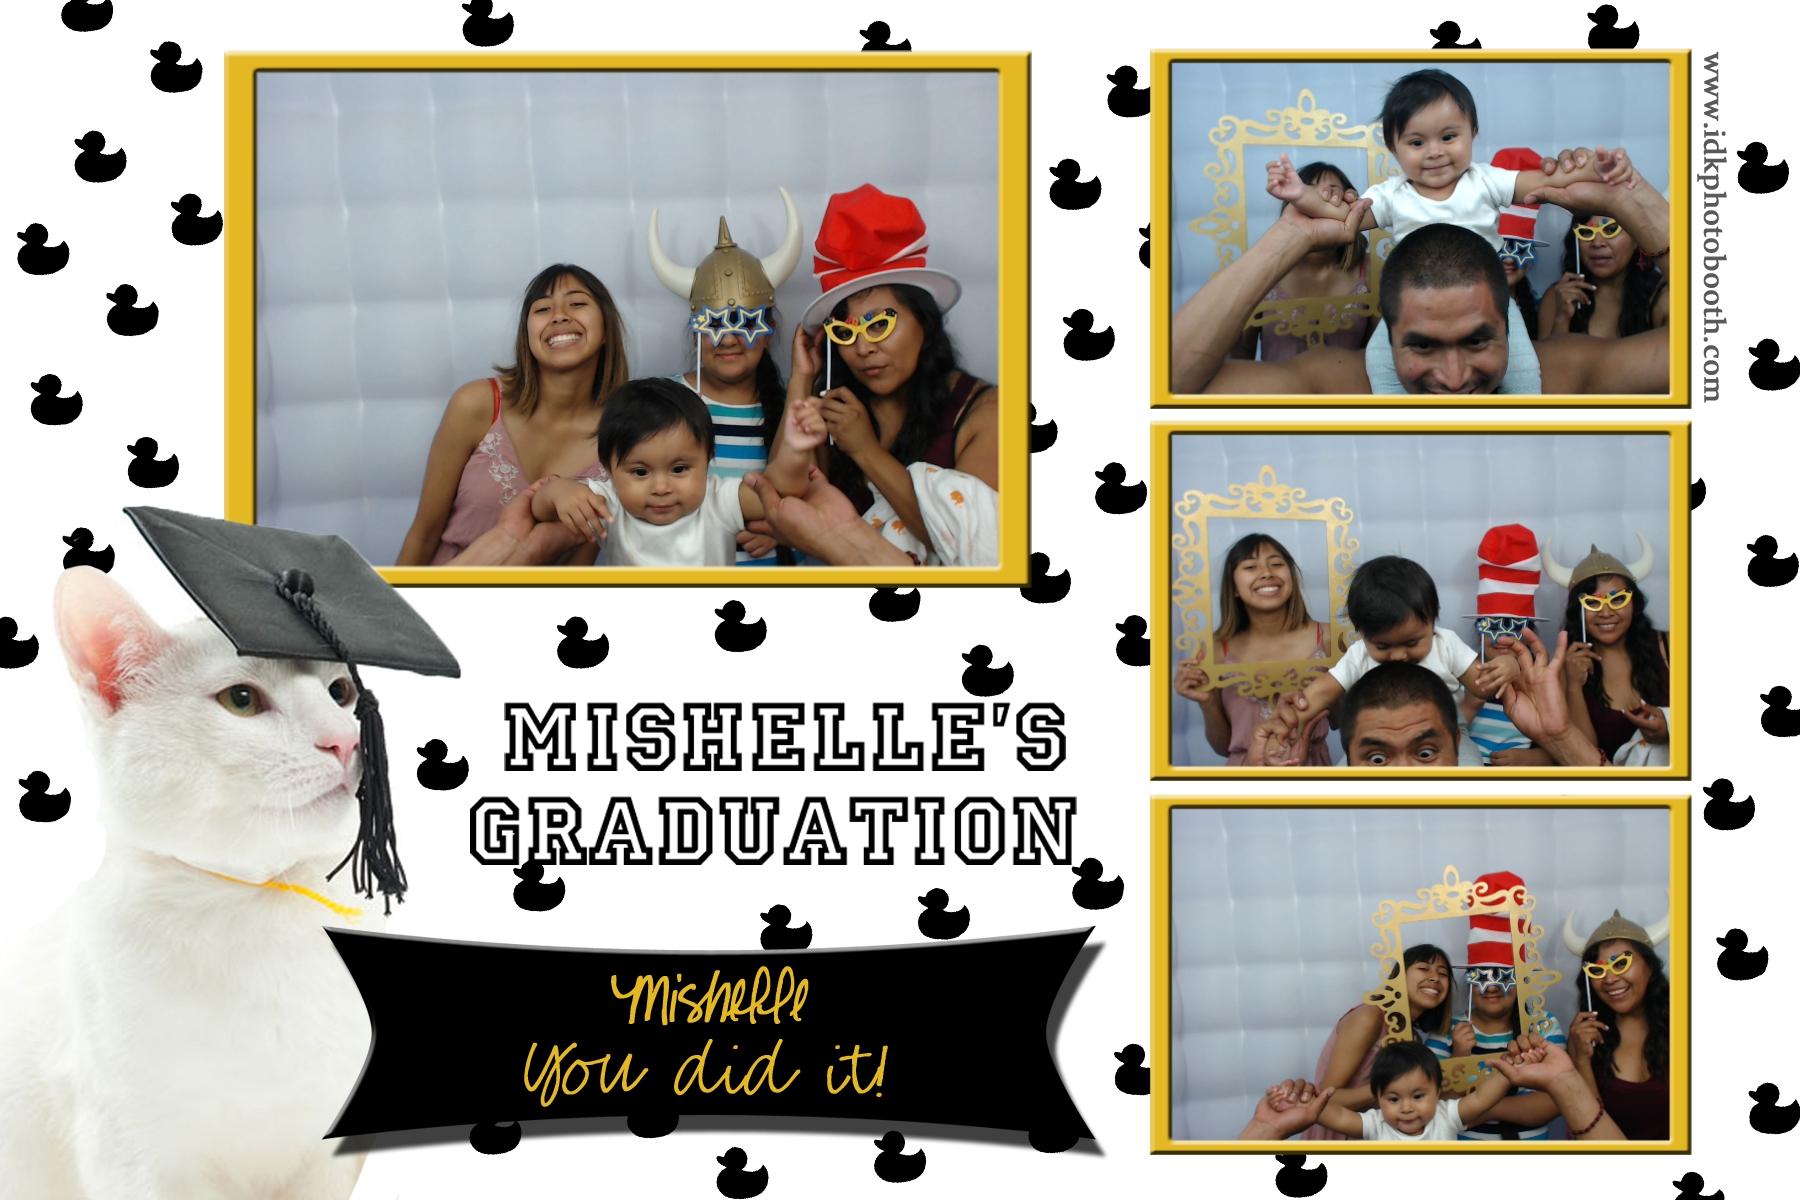 Mishelle's Graduation